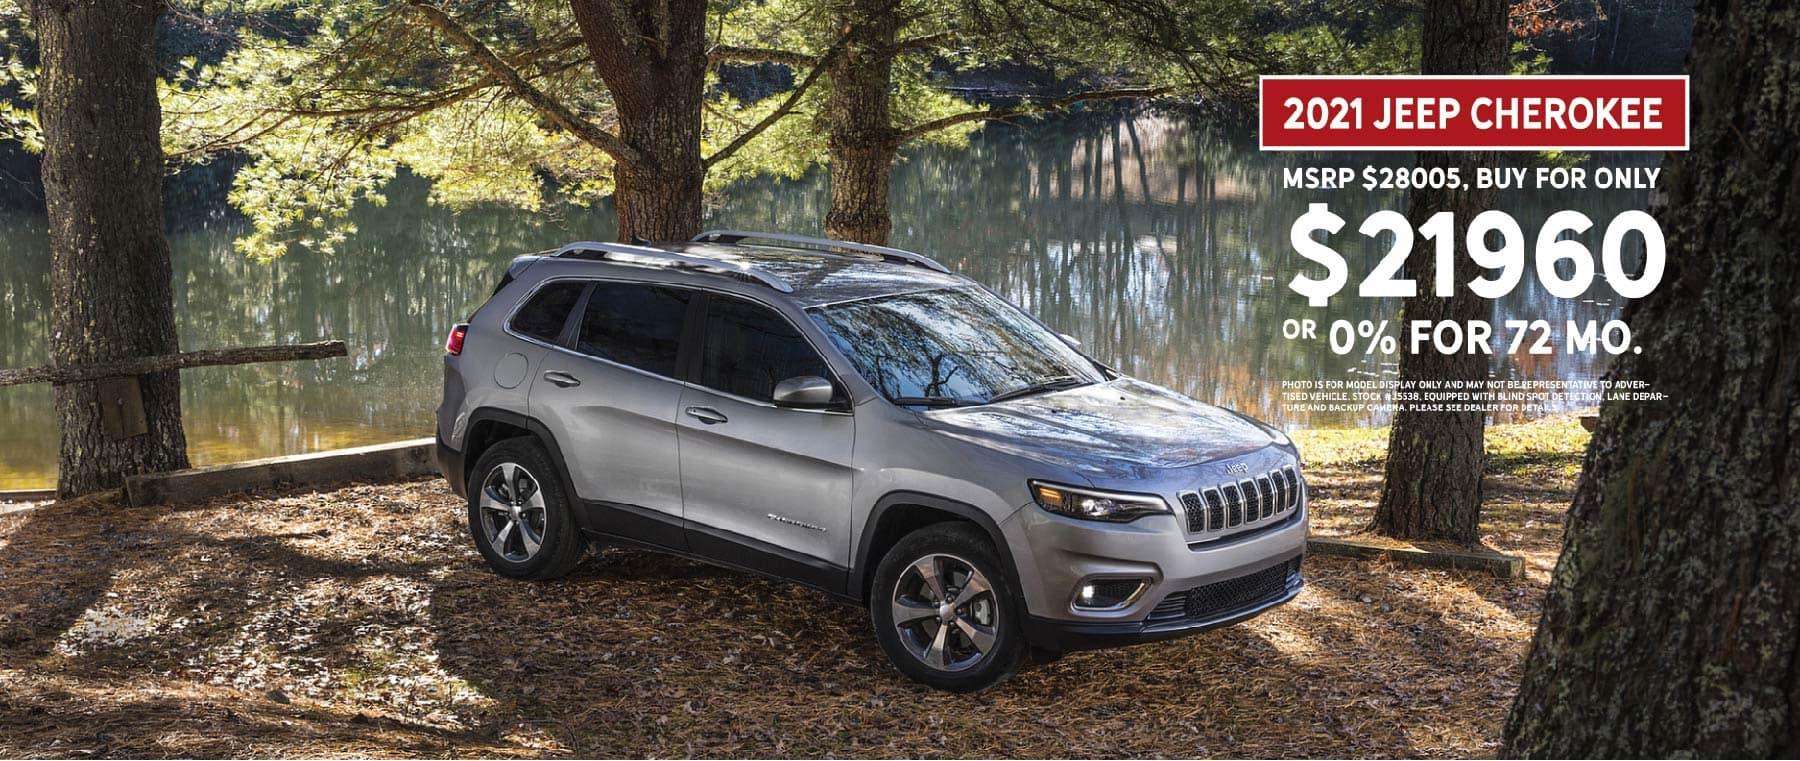 2021.03.10 – CDJRP – Jeep Cherokee Banner-01